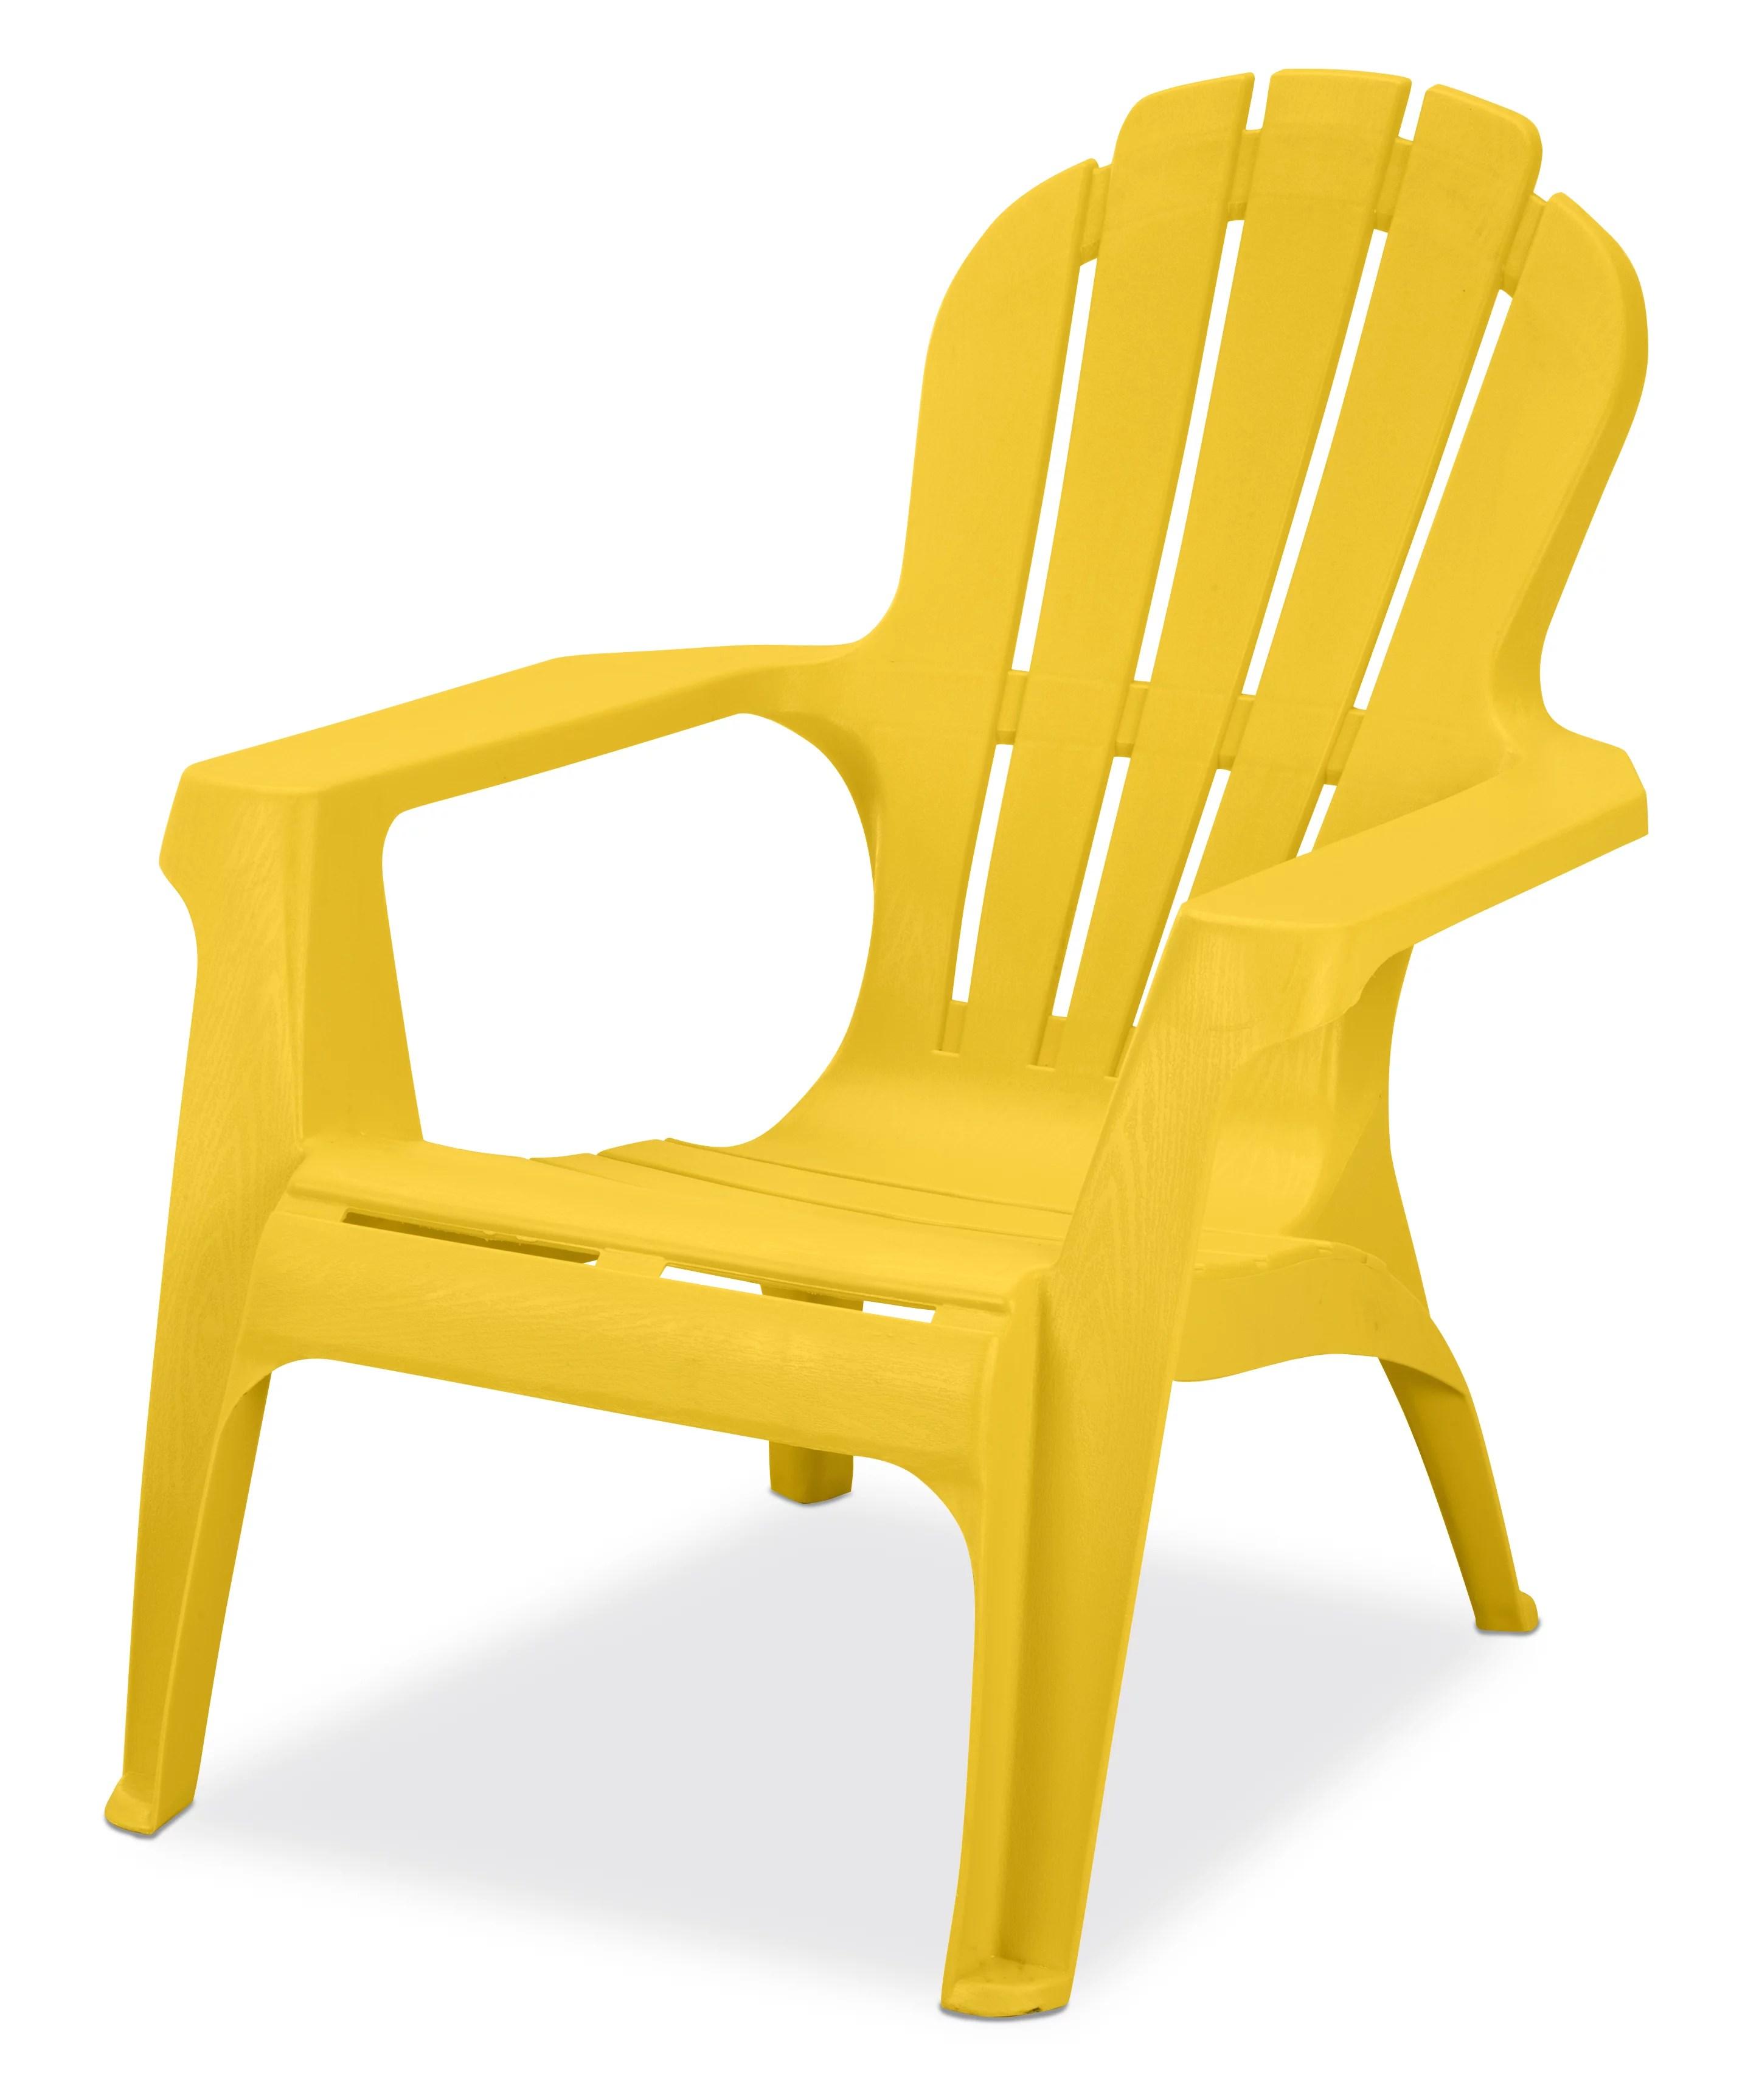 us leisure resin adirondack plastic patio furniture chair yellow walmart com walmart com